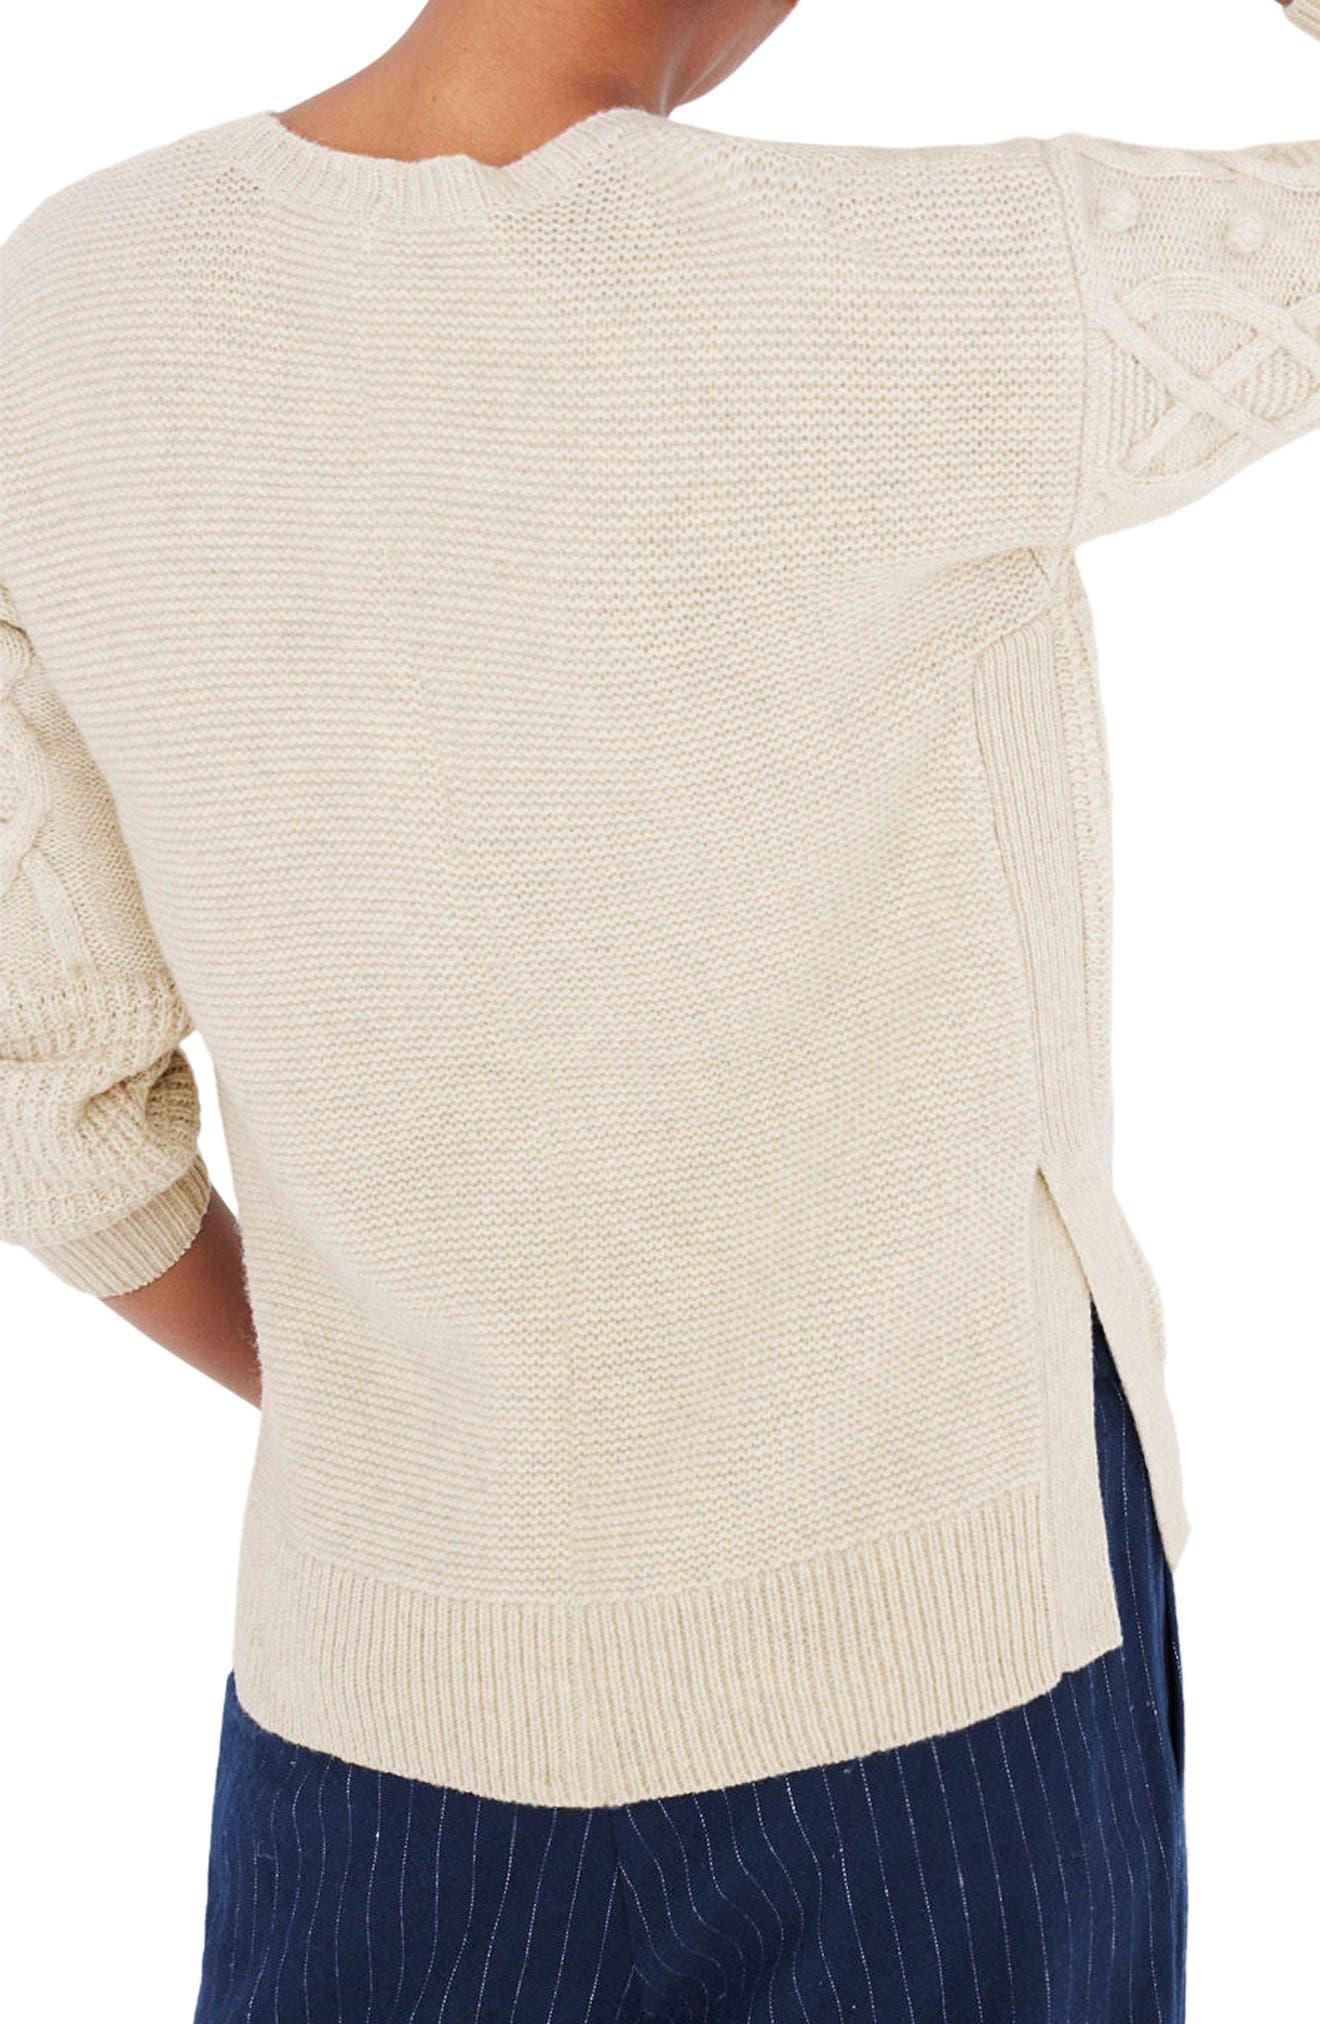 Open Side Bobble Pullover Sweater,                             Alternate thumbnail 2, color,                             020